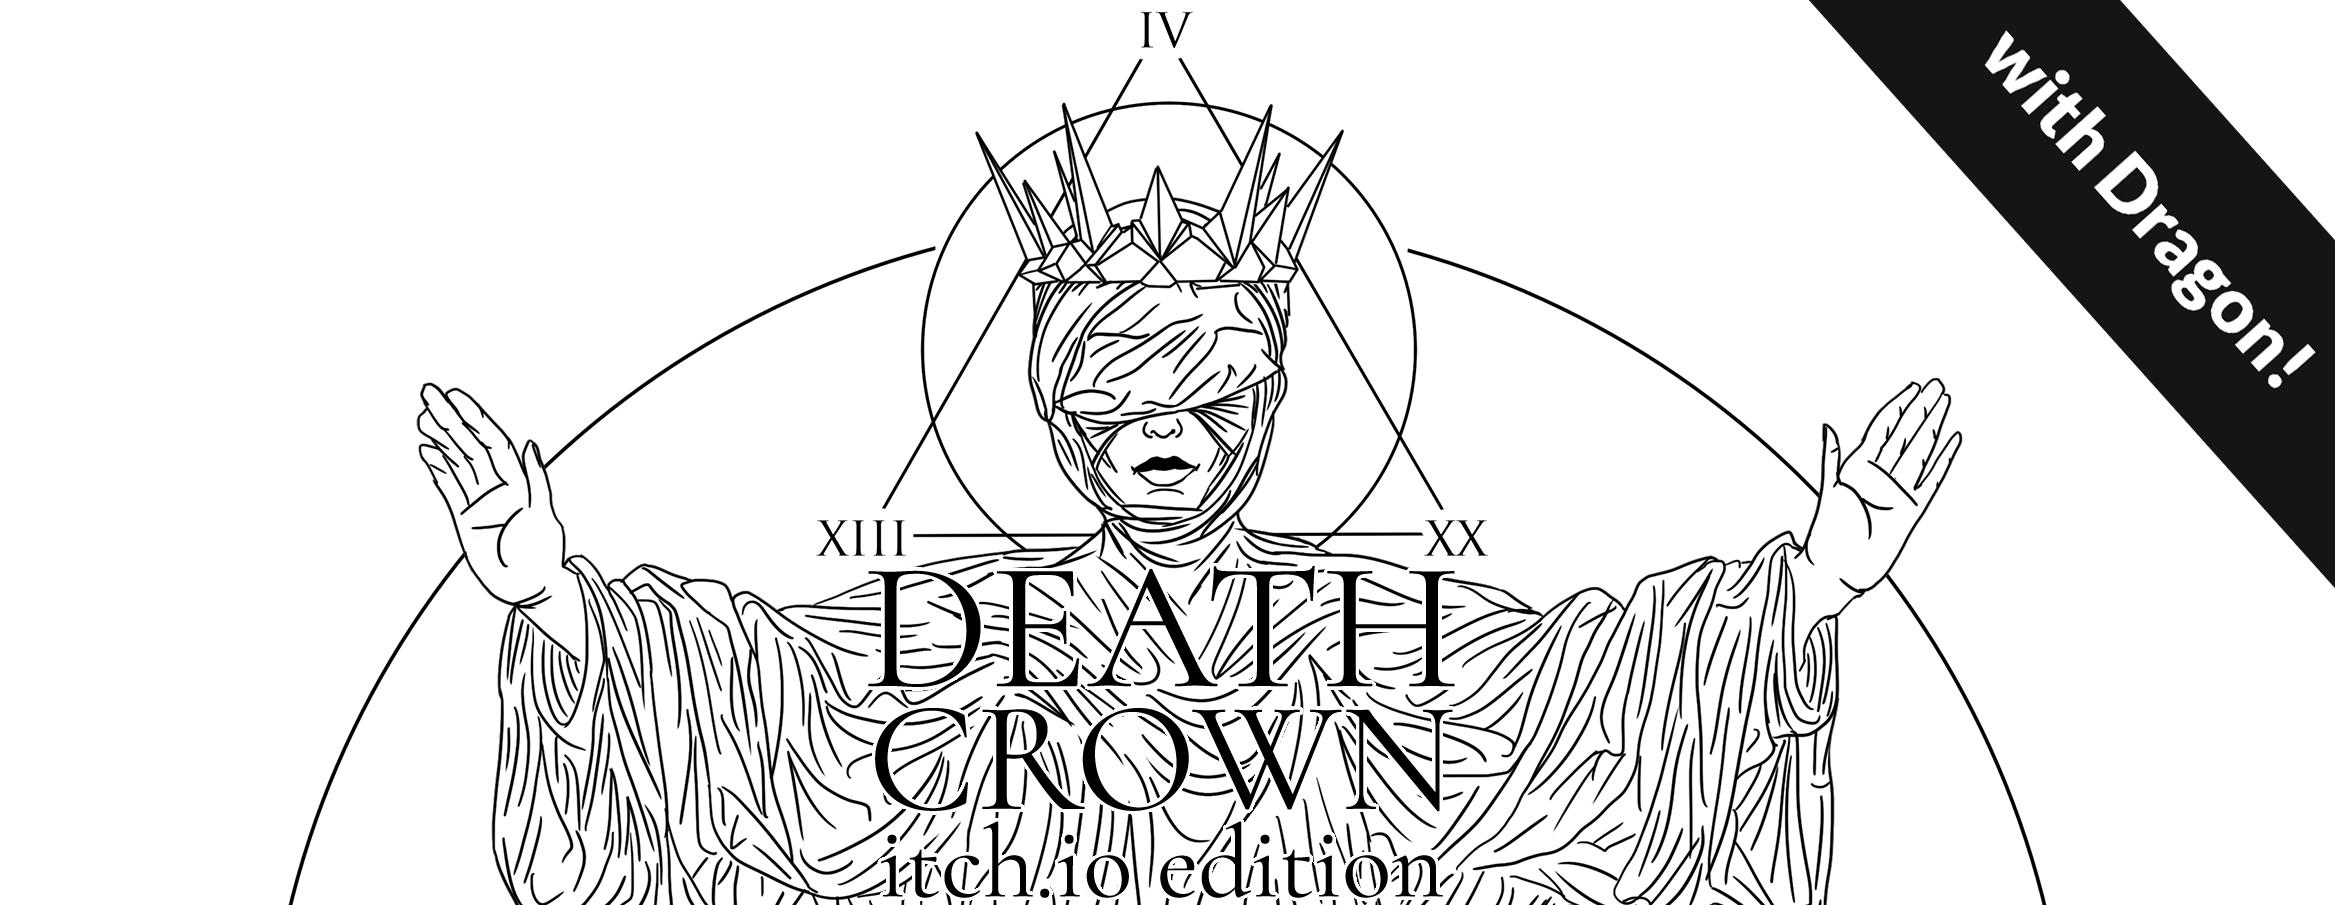 Death Crown — itch.io edition